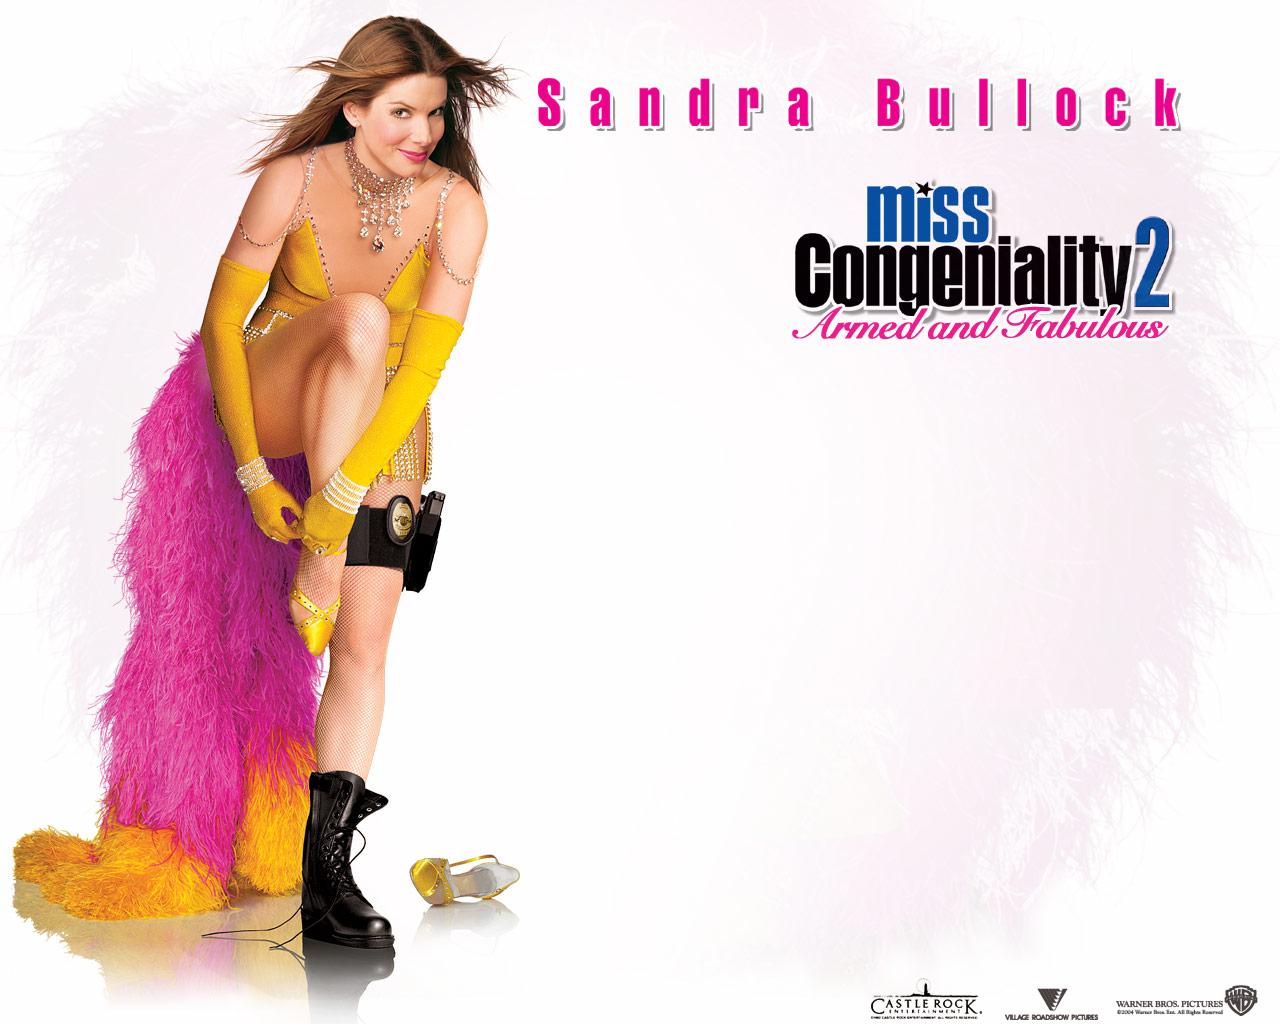 Miss congeniality 2 4